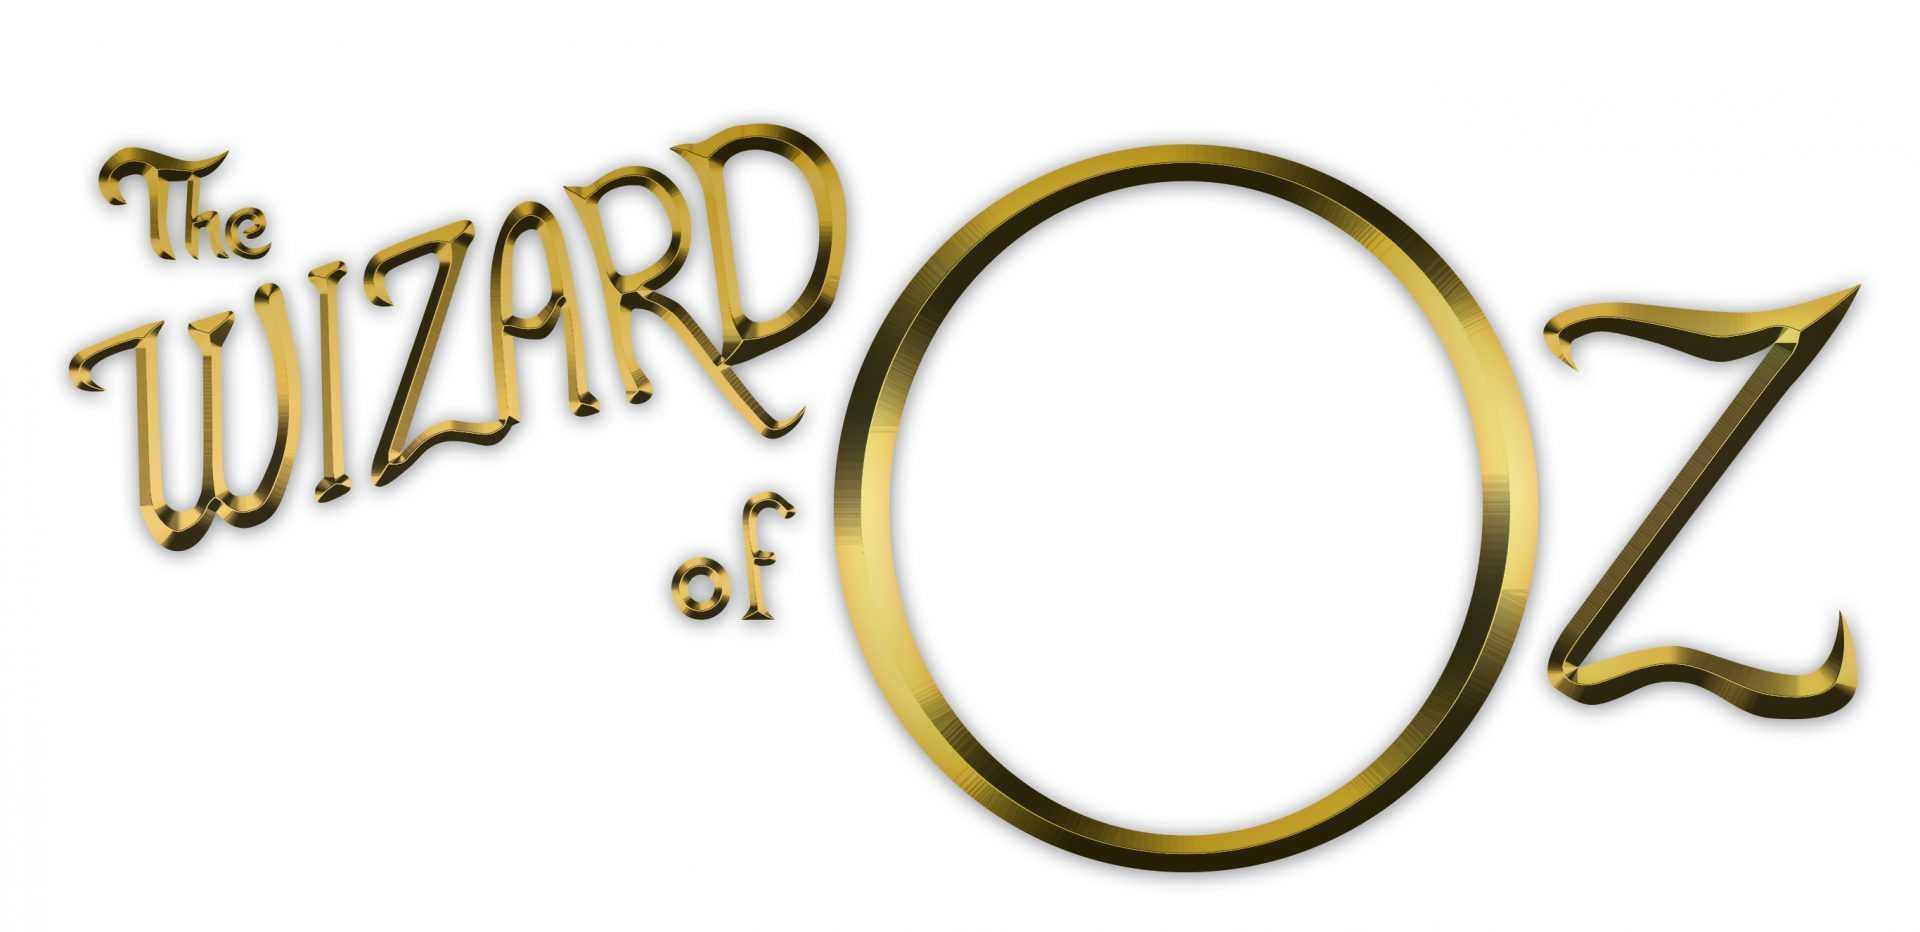 180621_Wizard of Oz Logo